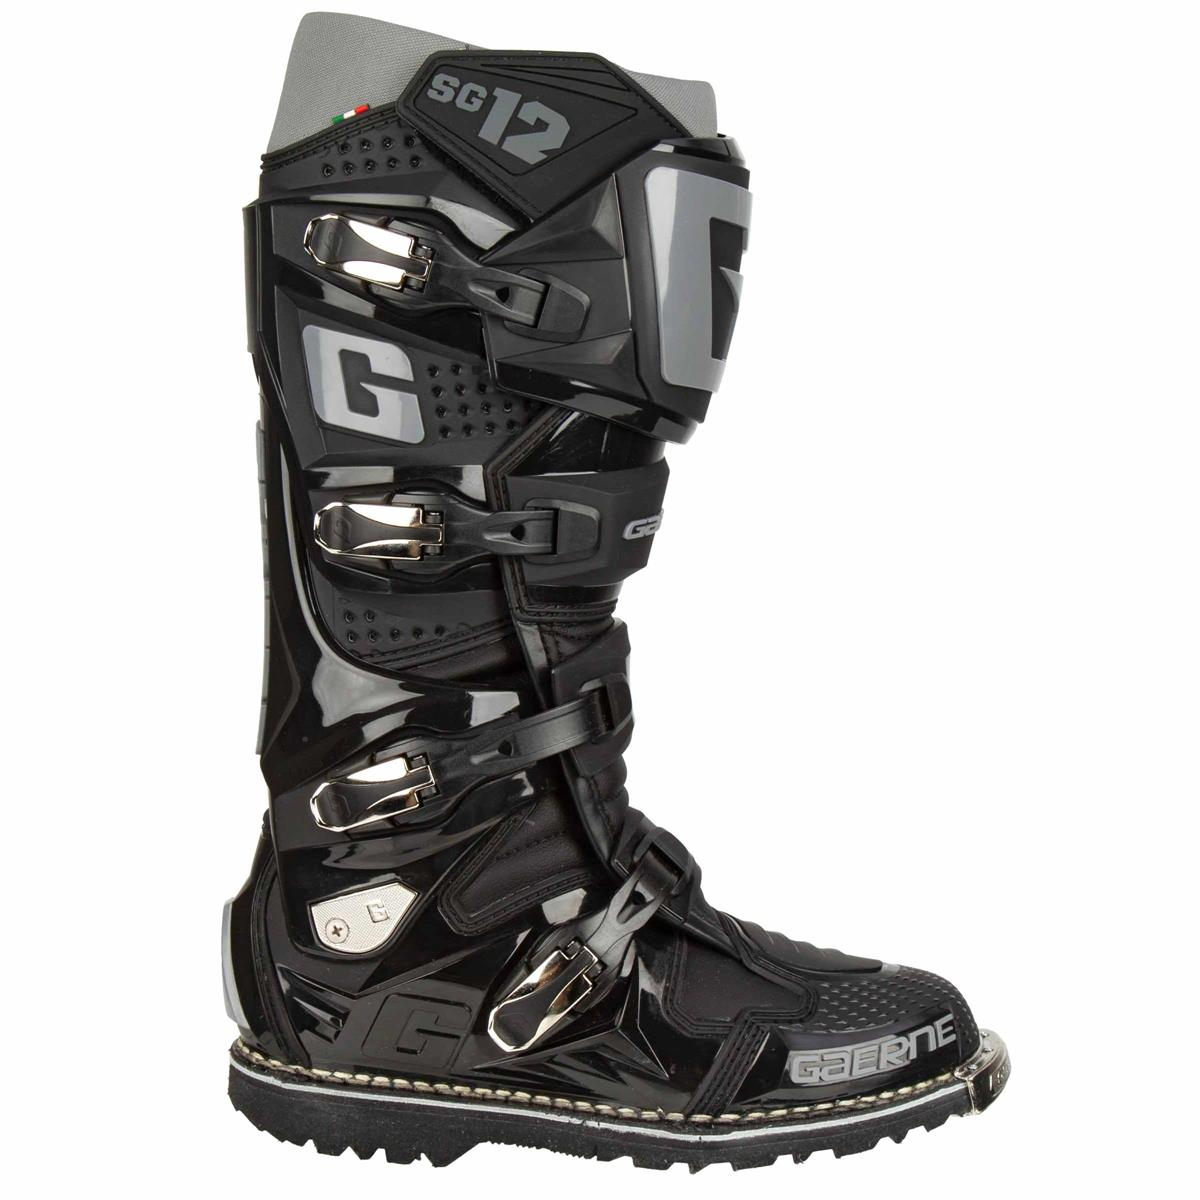 Gaerne MX Boots SG 12 Enduro Black